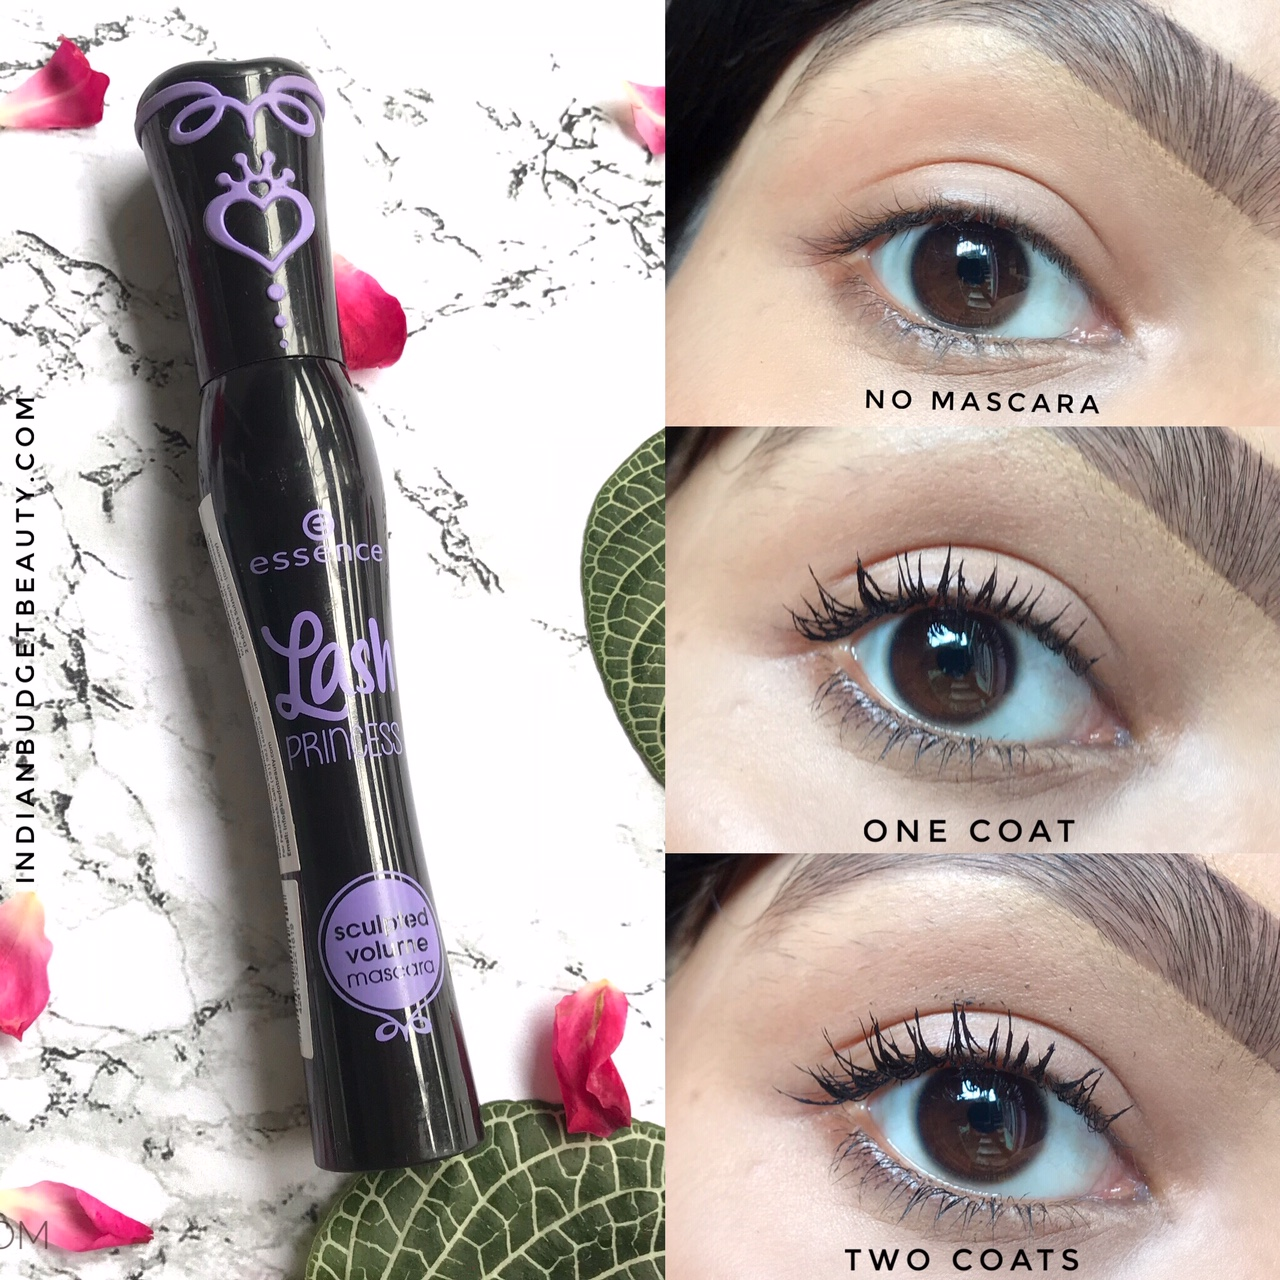 Essence Lash Princess Sculpted Volume Mascara Review